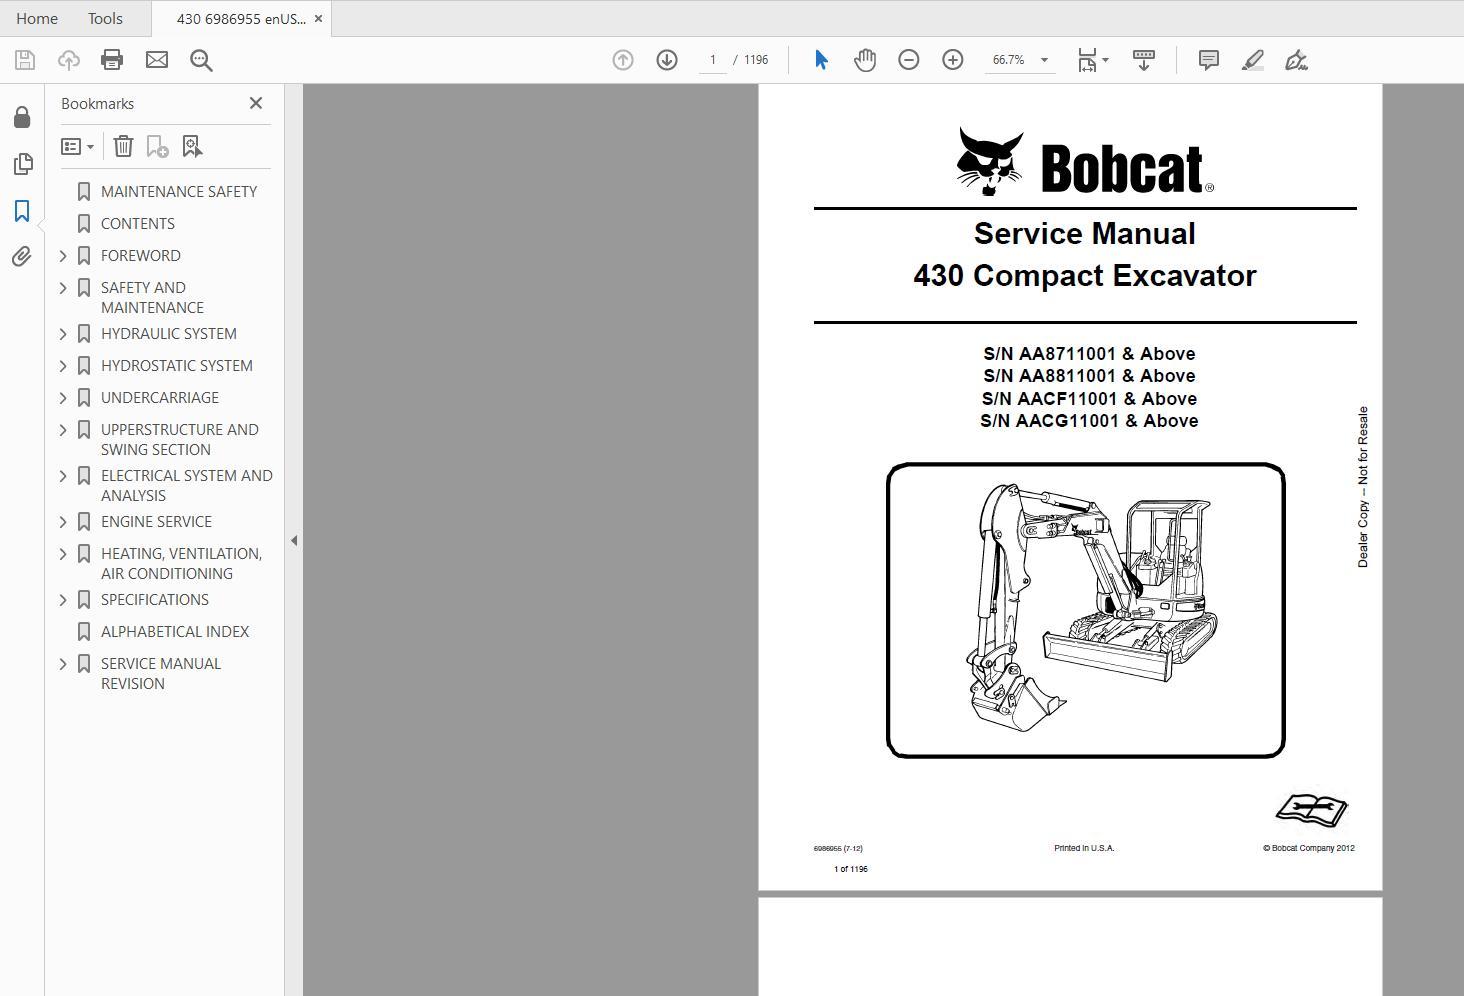 Bobcat_Excavator_Service_Library_2017_DVD7